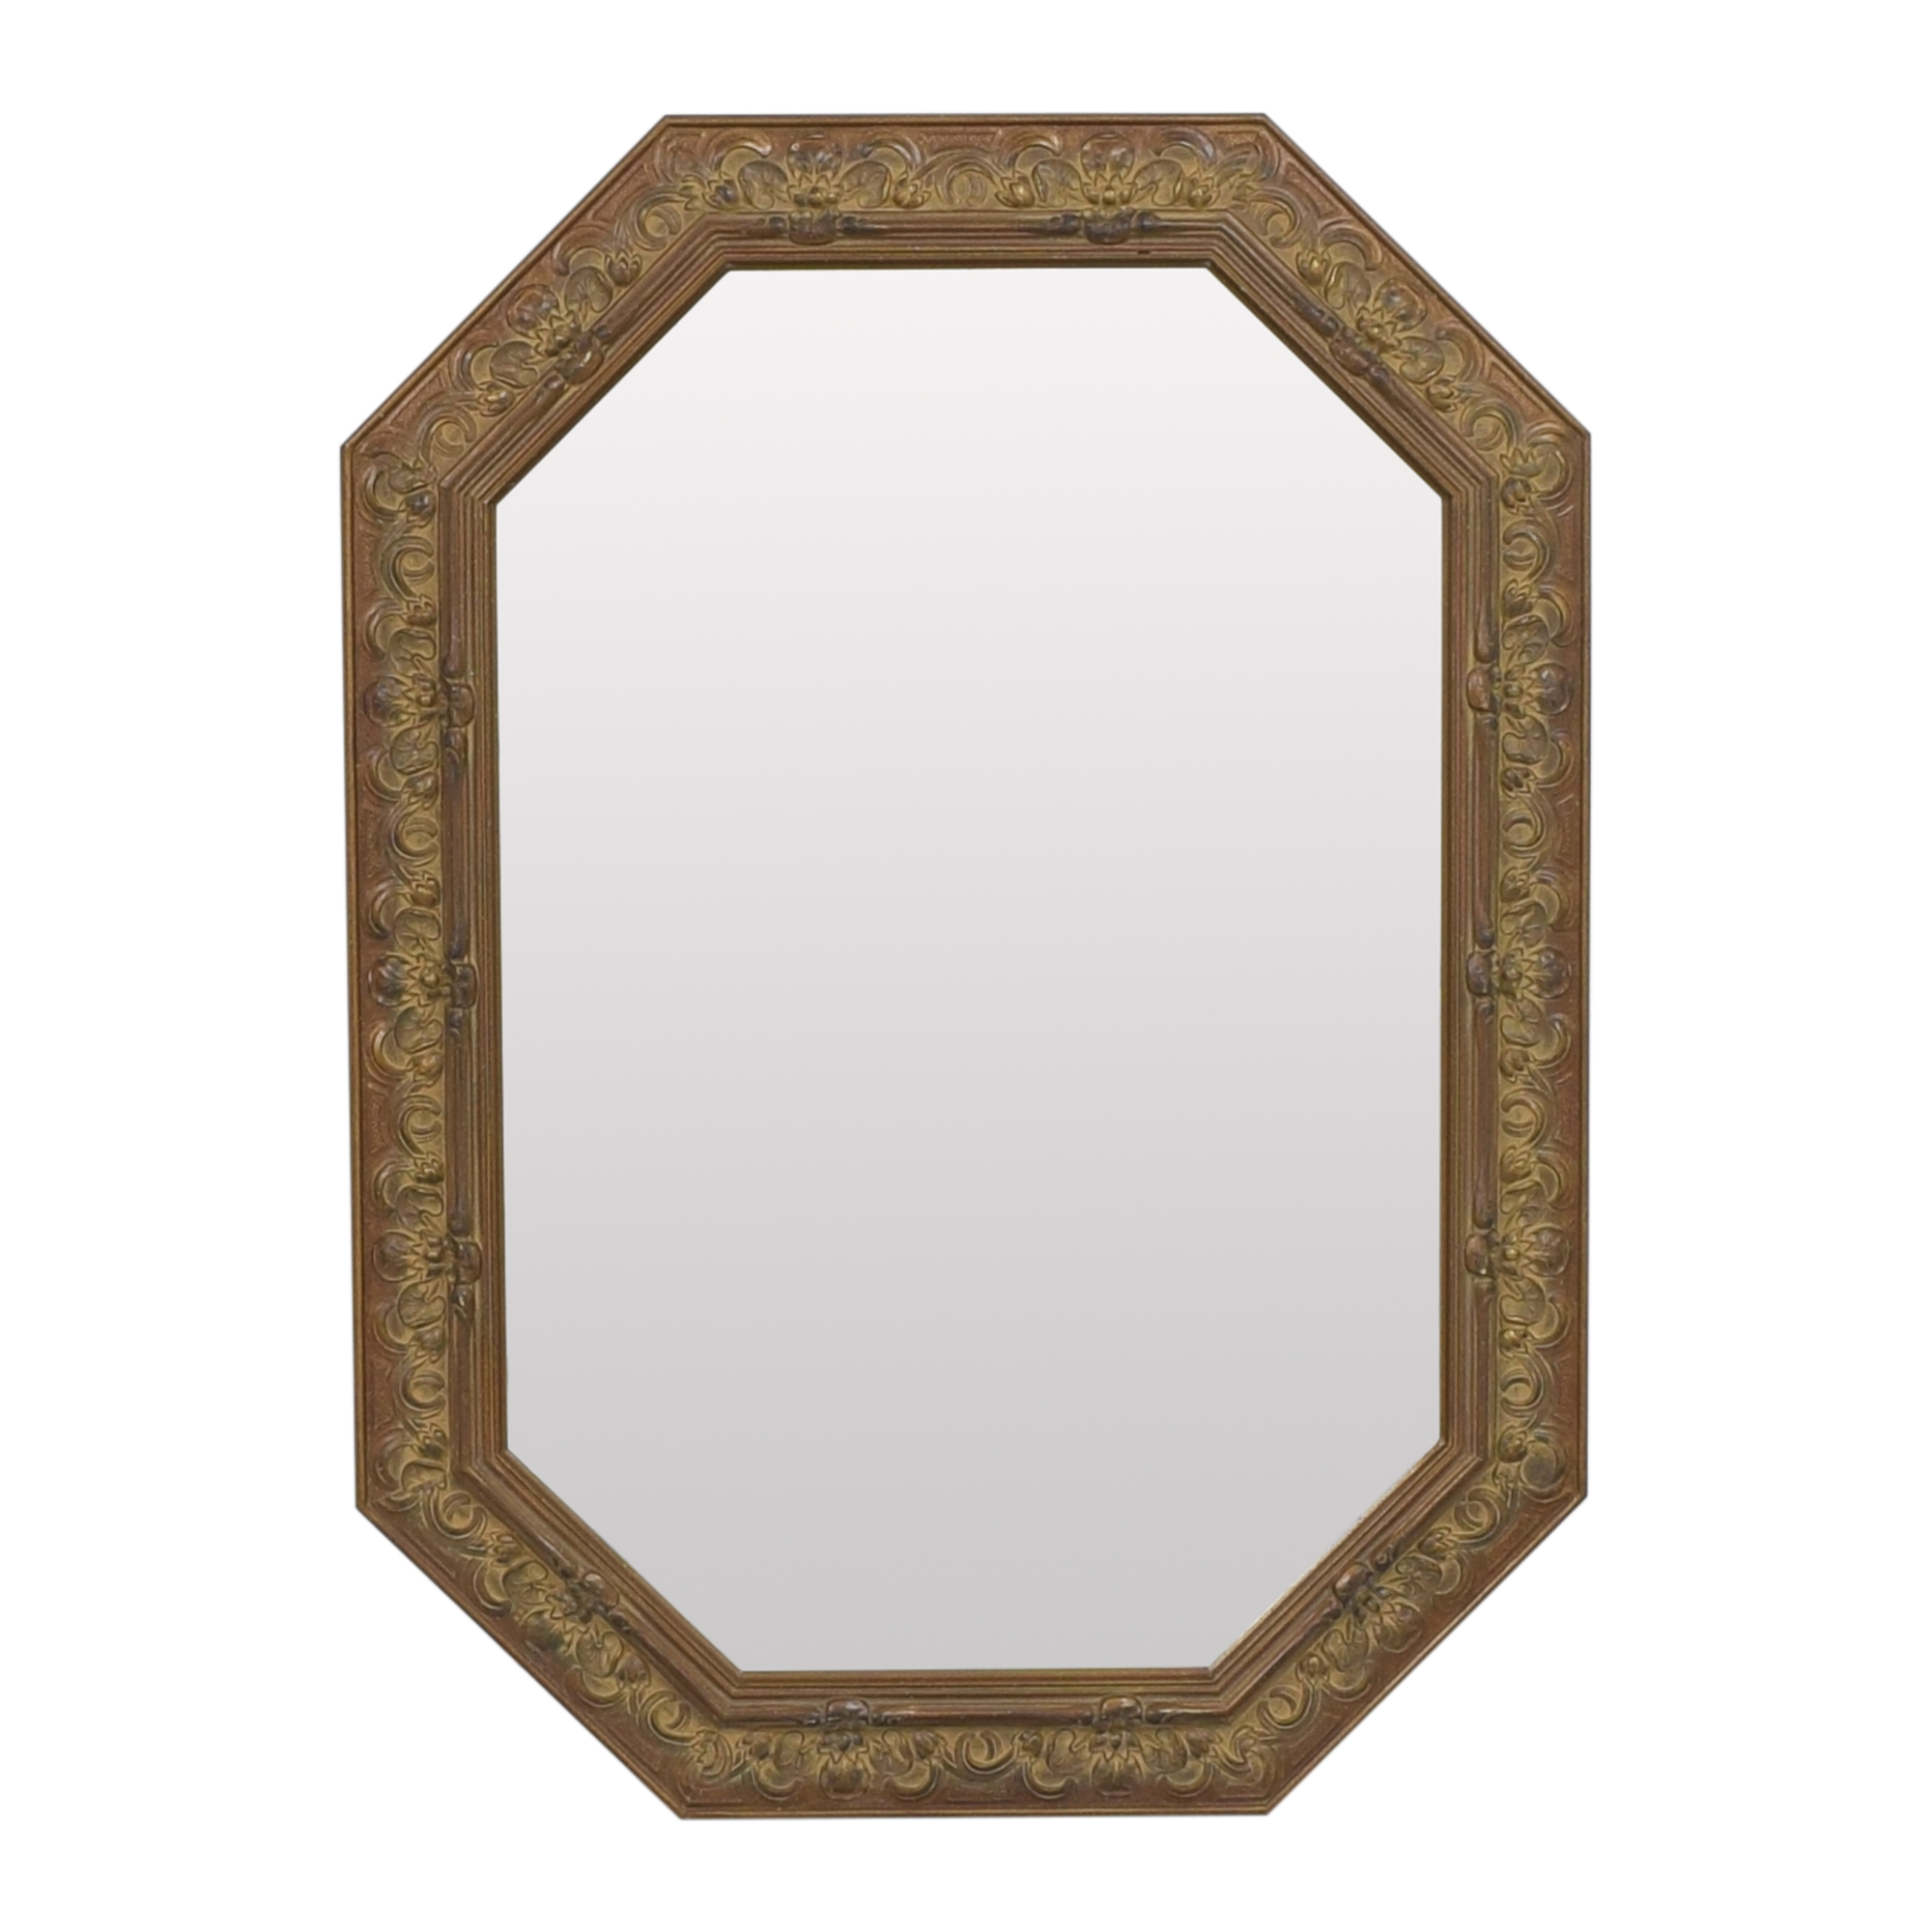 Ethan Allen Ethan Allen Octagonal Wall Mirror dimensions